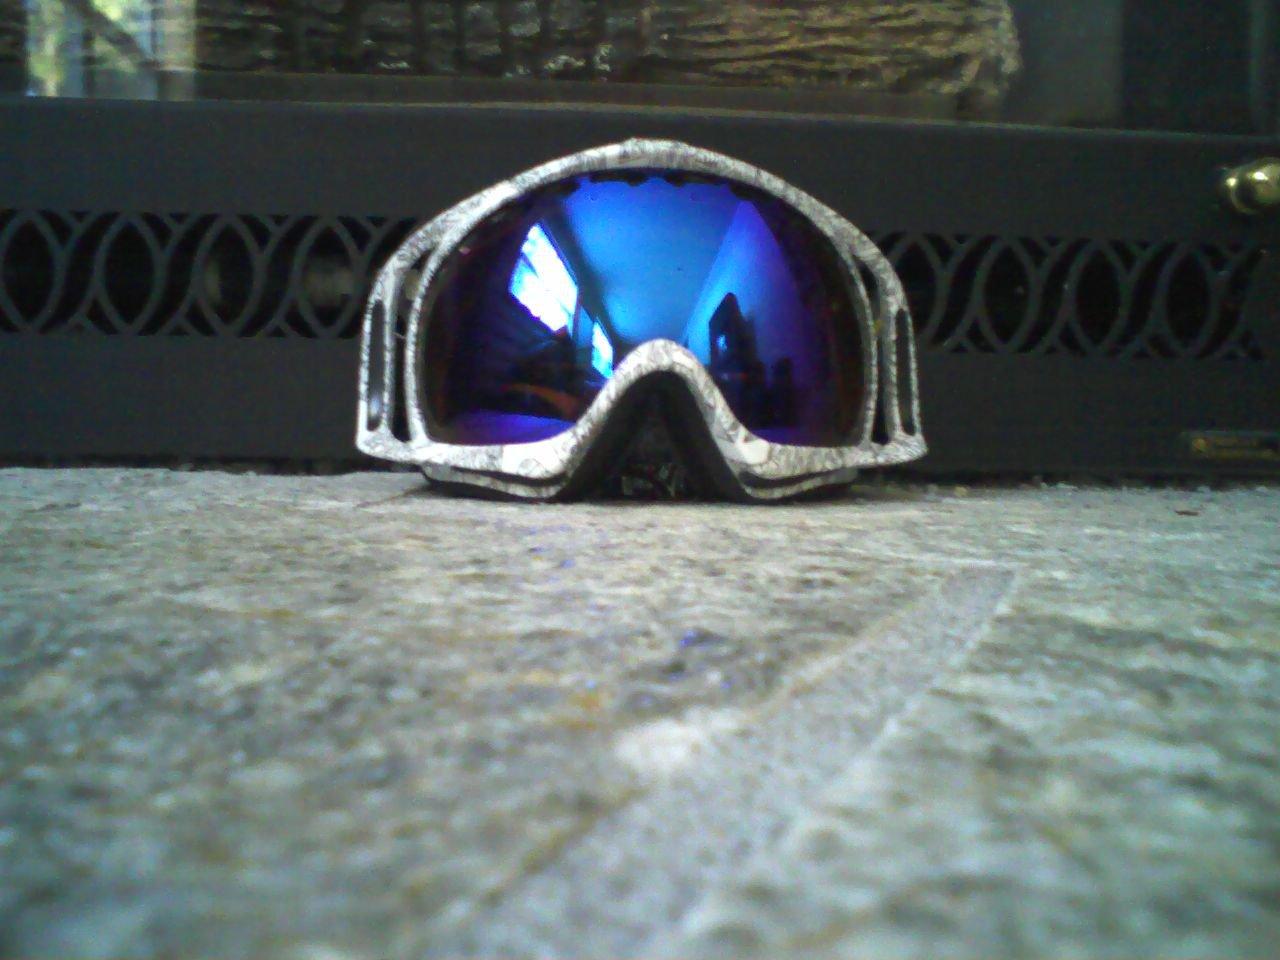 Blue iridium lens